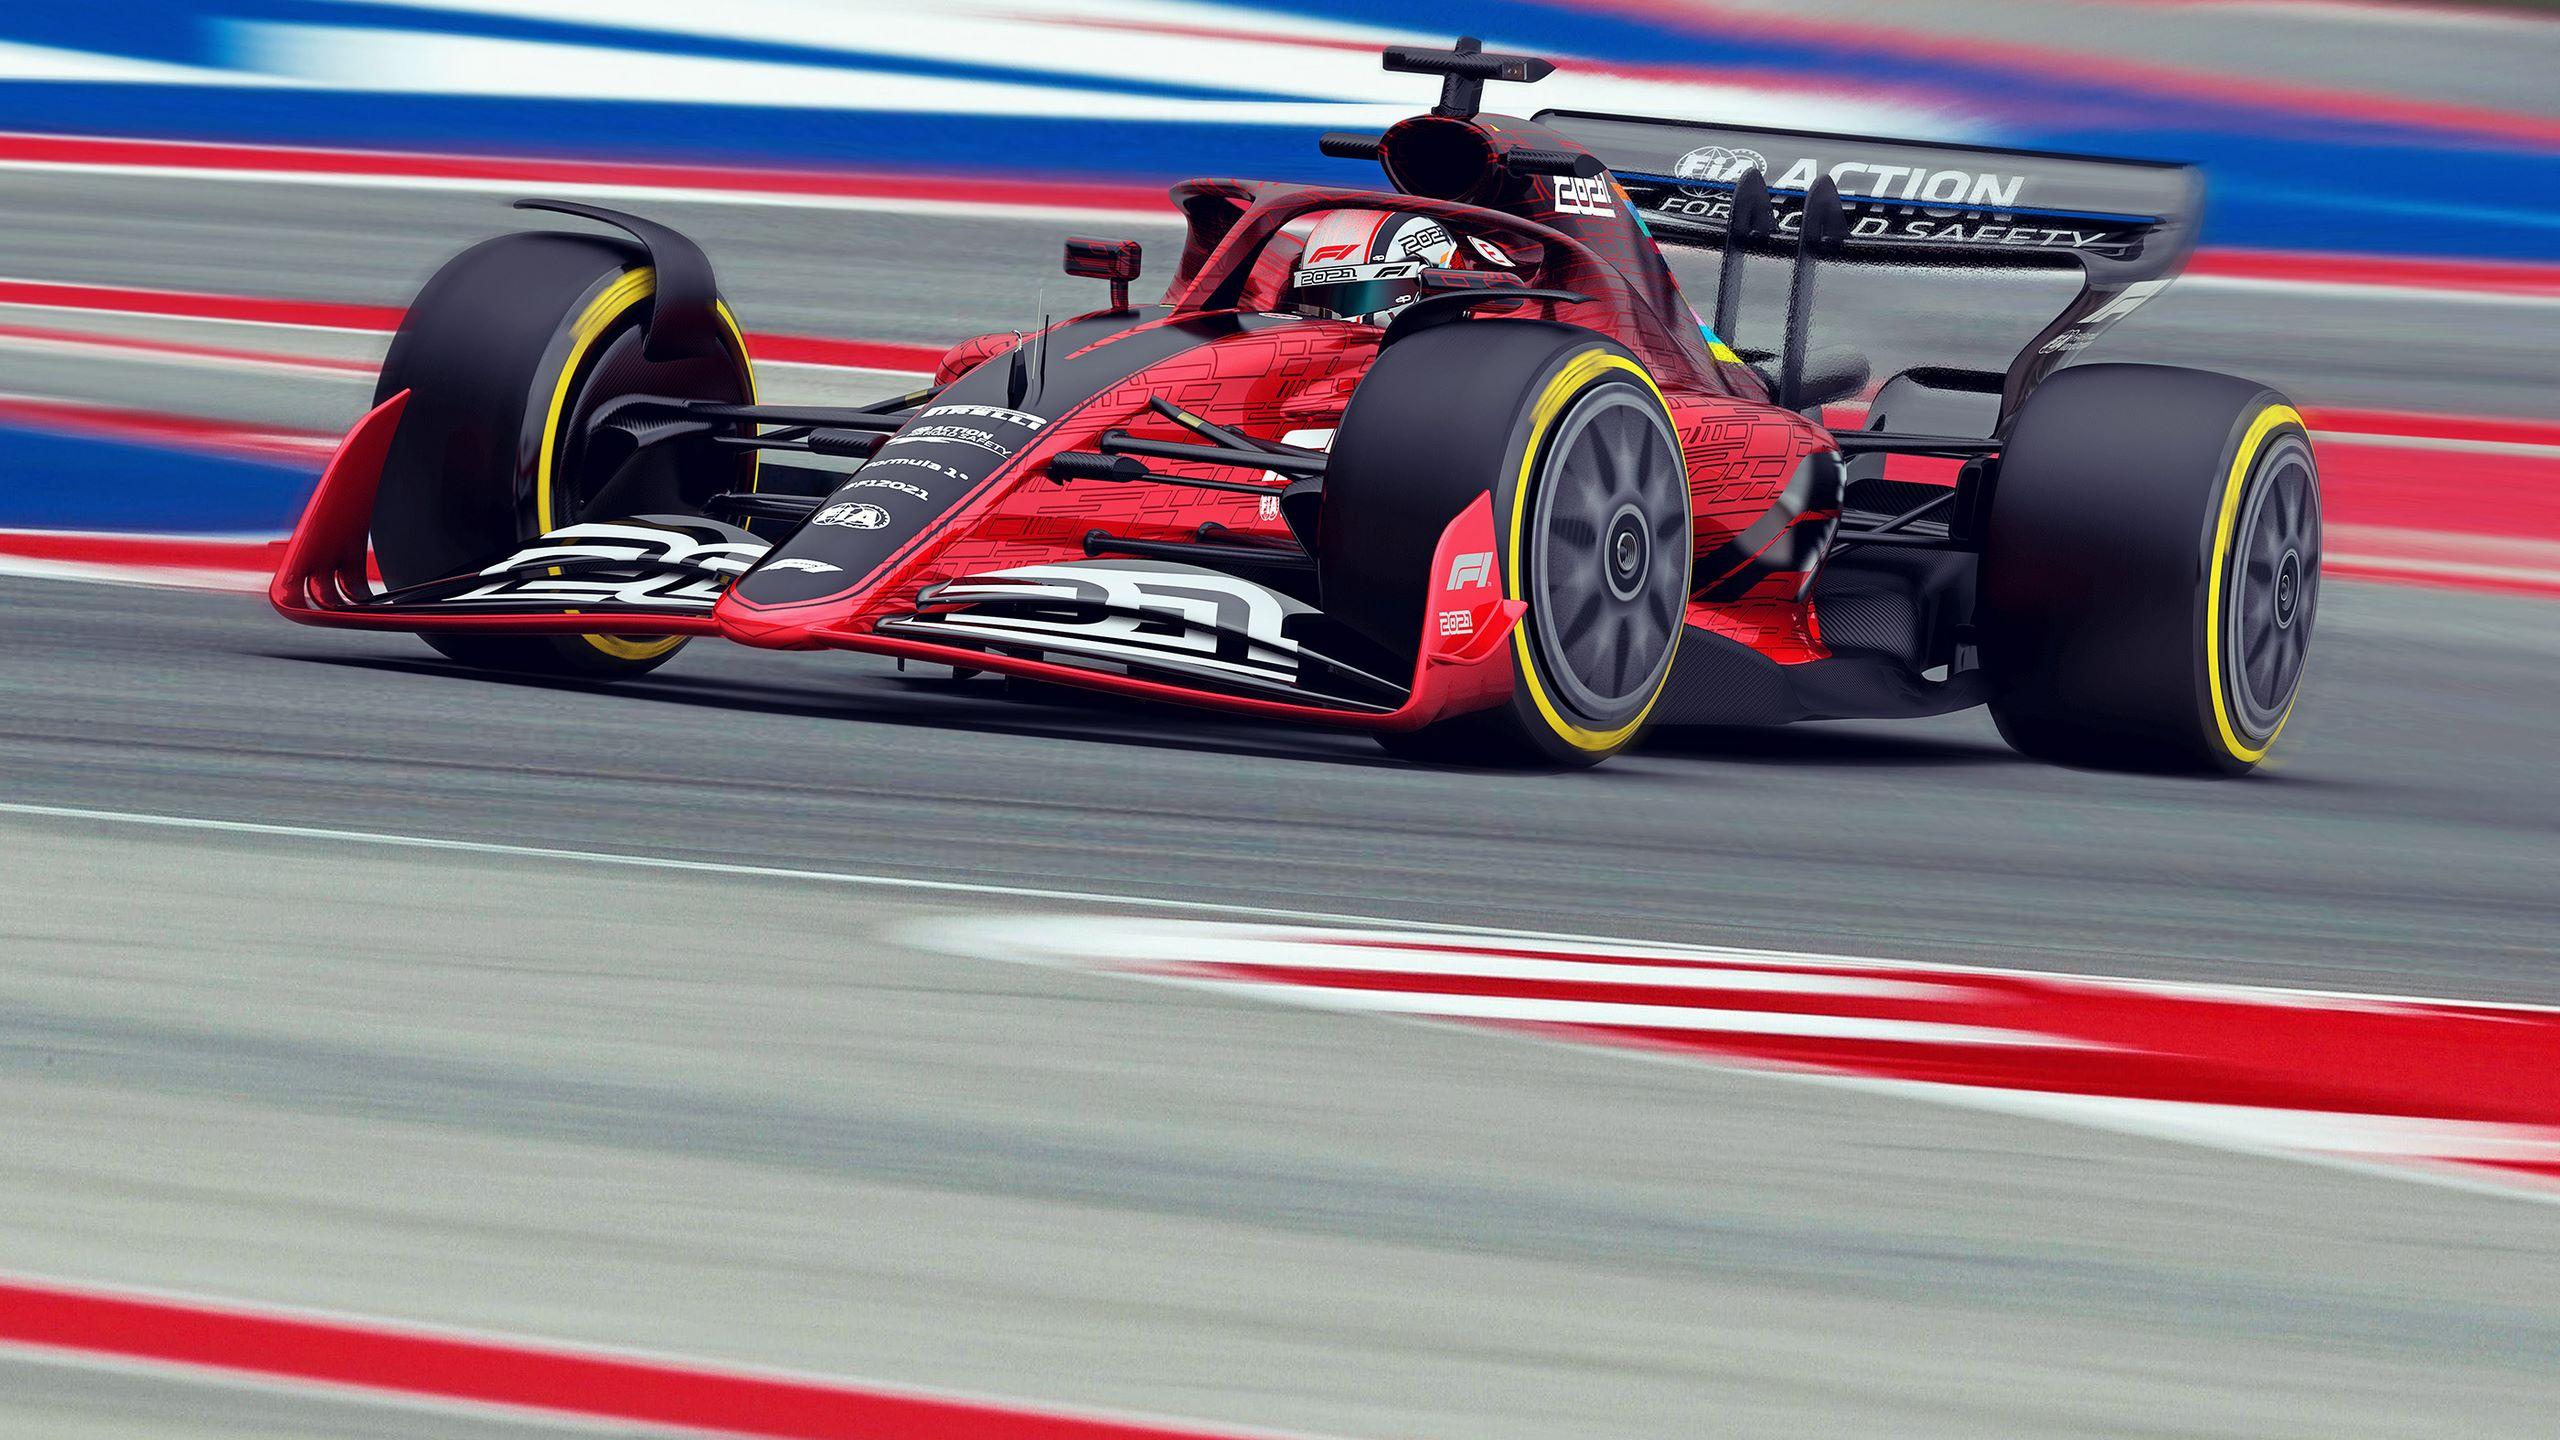 2021-formula-1-race-car-rendering f1 (12)